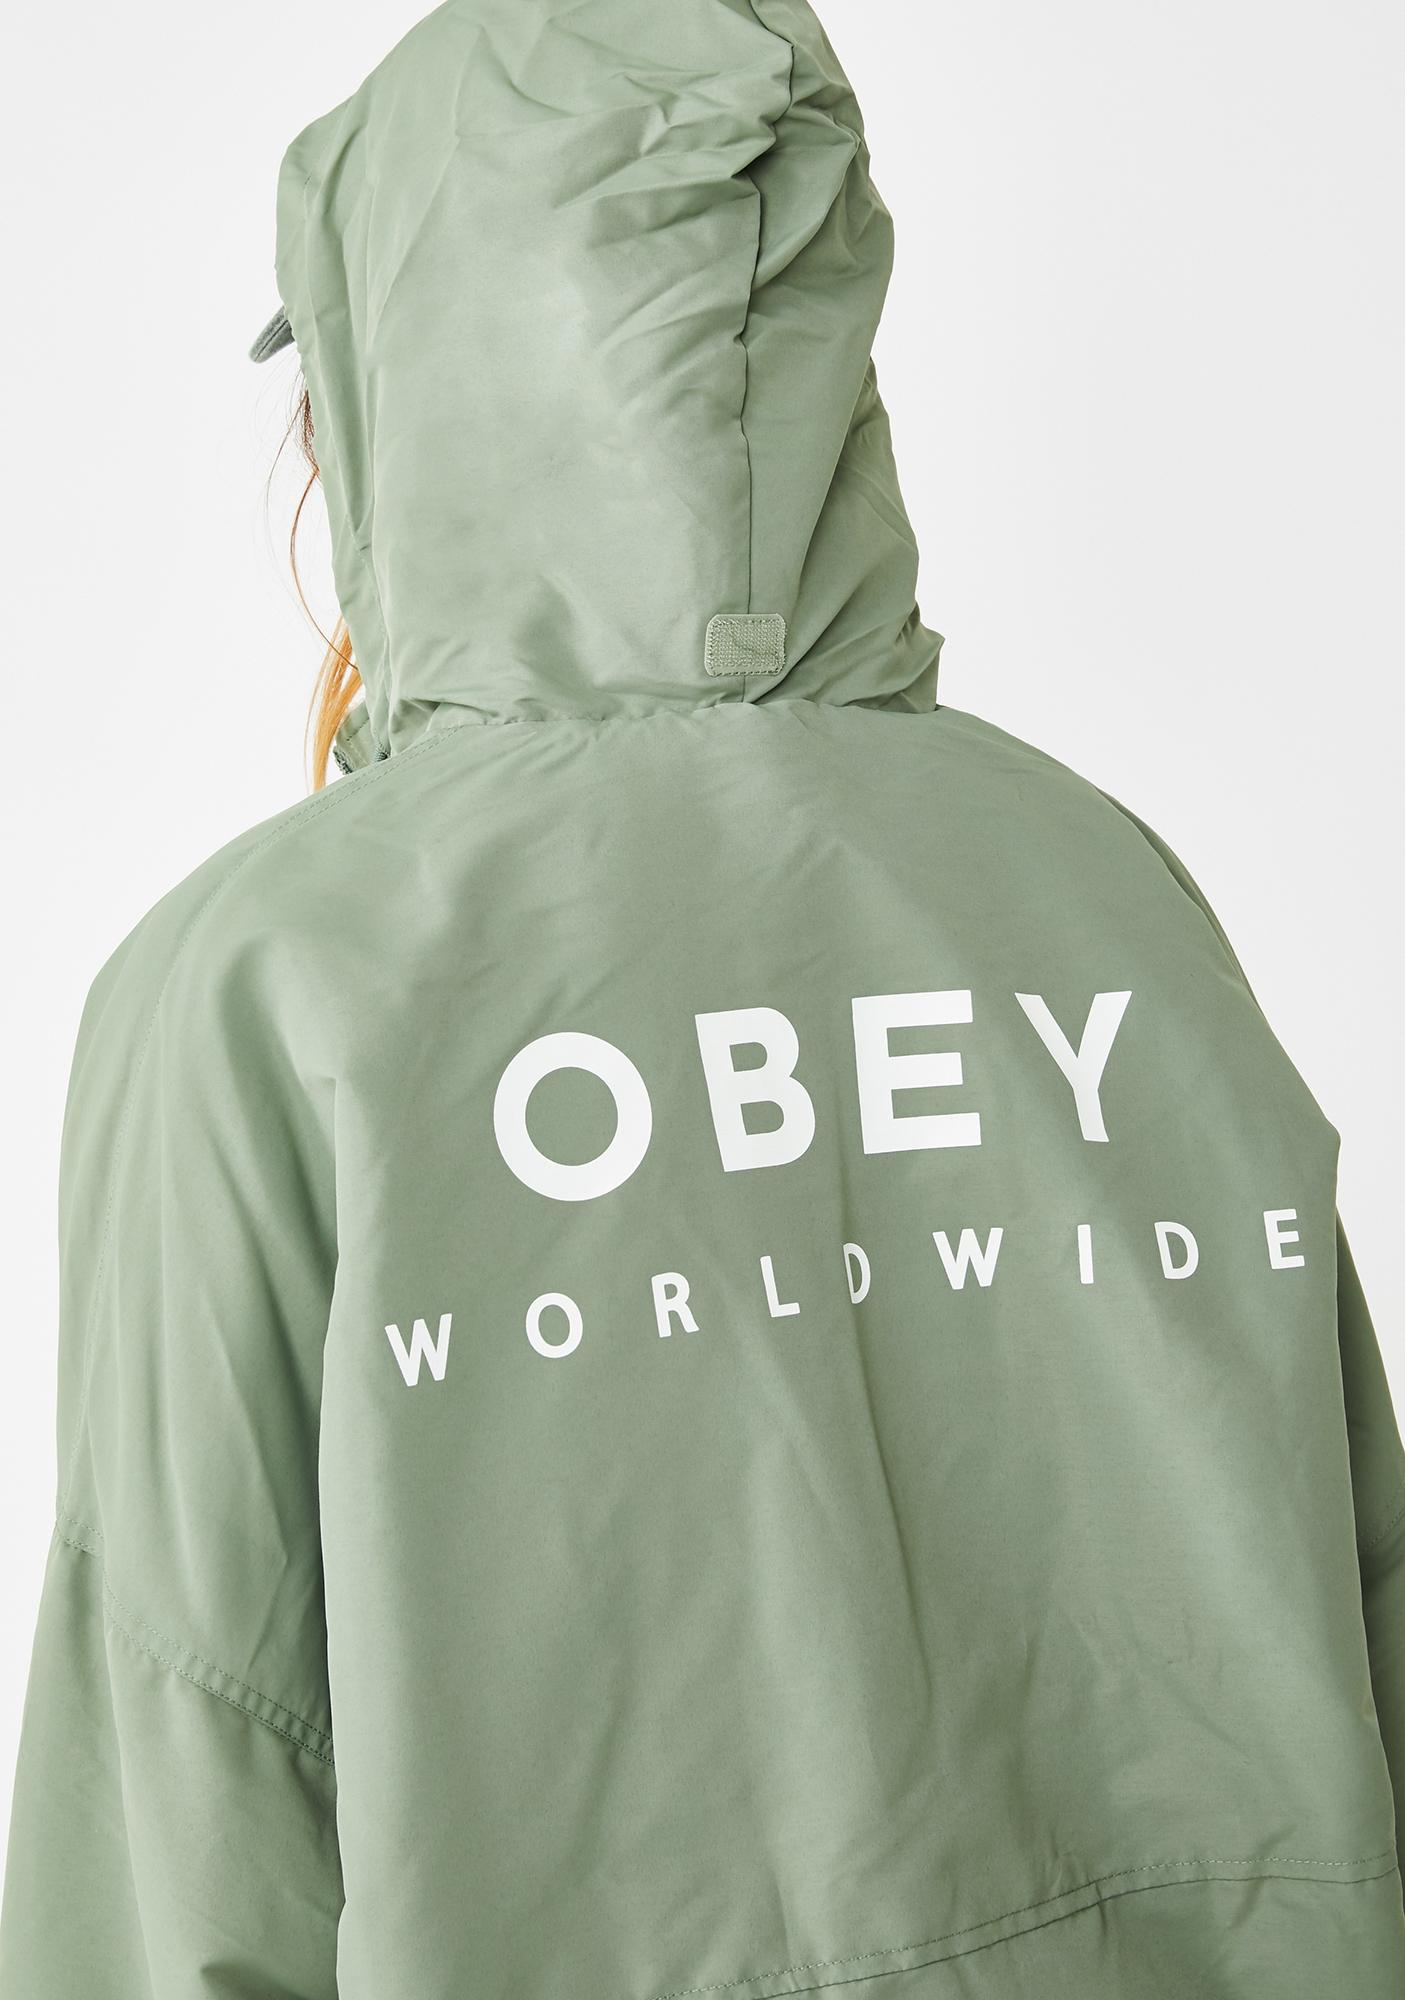 Obey Montaigne Parka Jacket